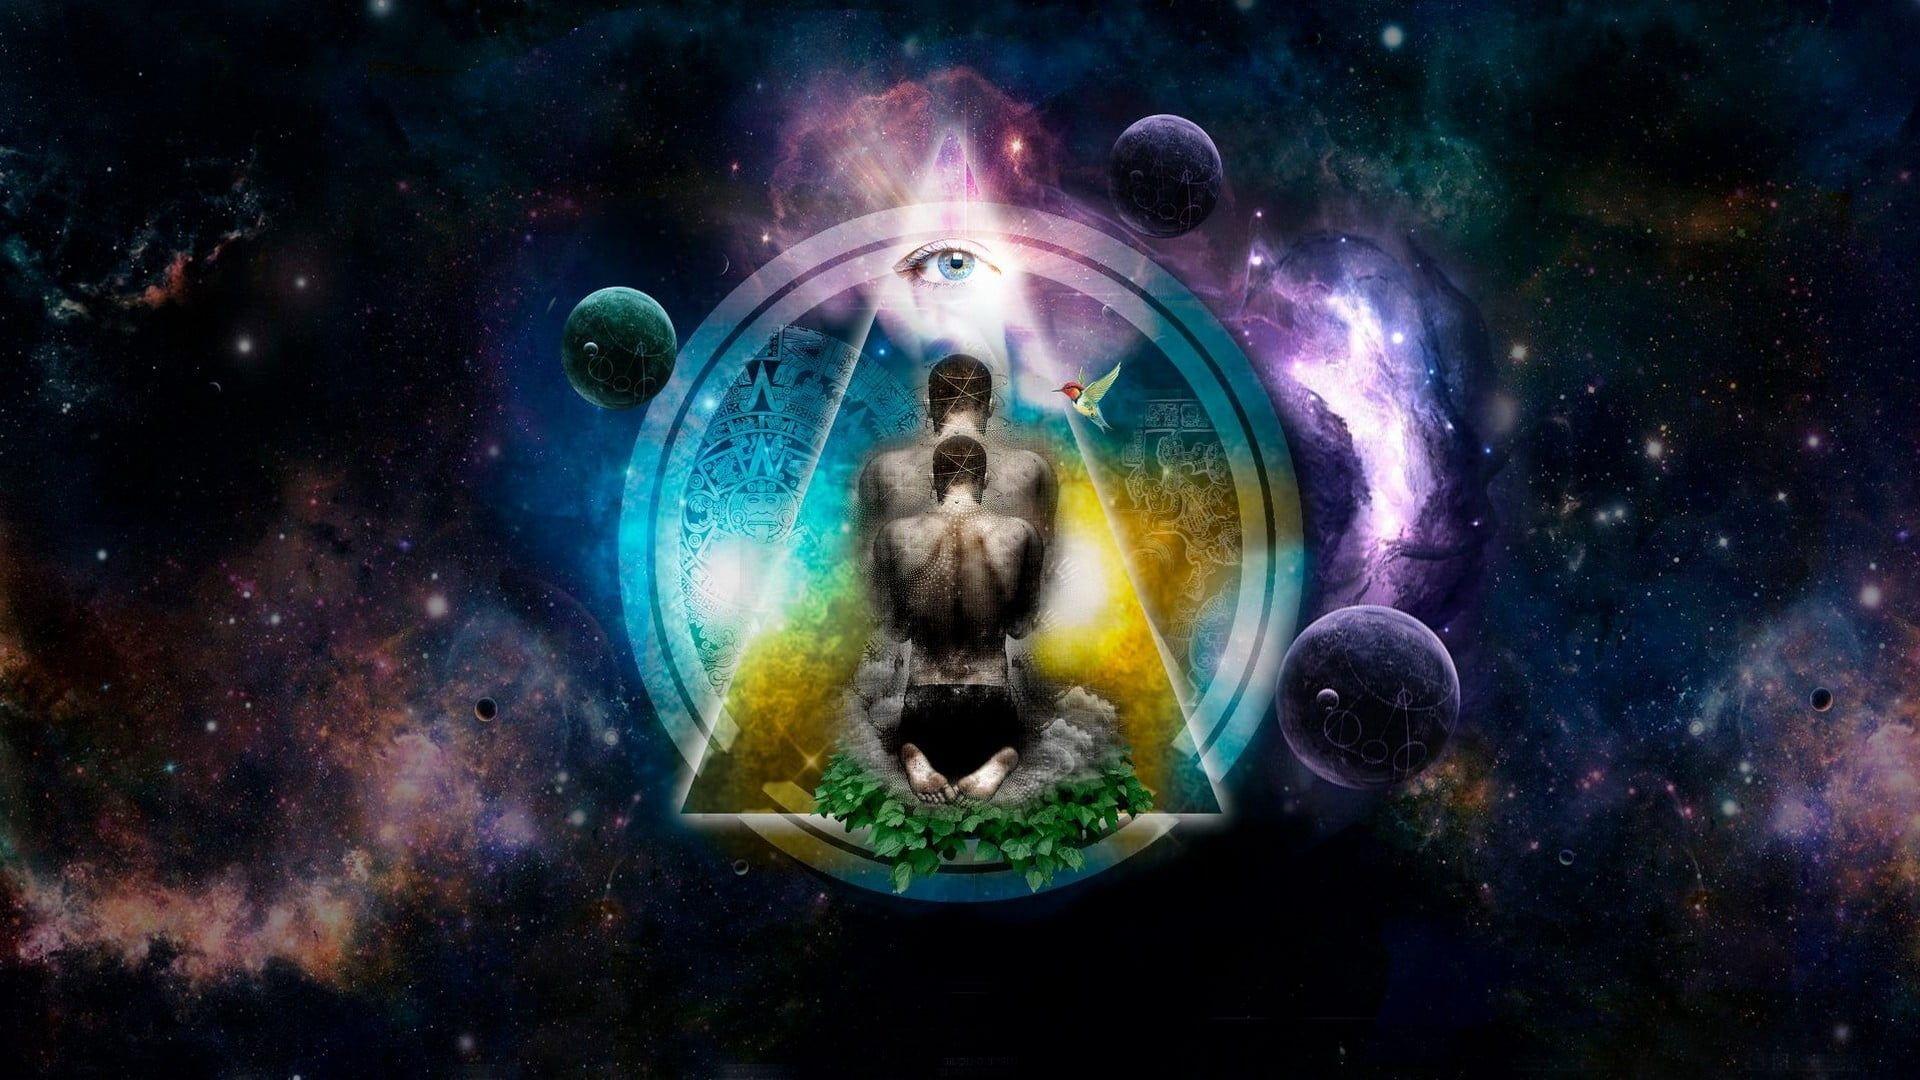 Multicolored Galaxy Digital Wallpaper Meditation Spiritual Digital Art Eyes Space 1080p Wallpaper Hdwallpaper In 2020 Spirituality Meditation Digital Wallpaper